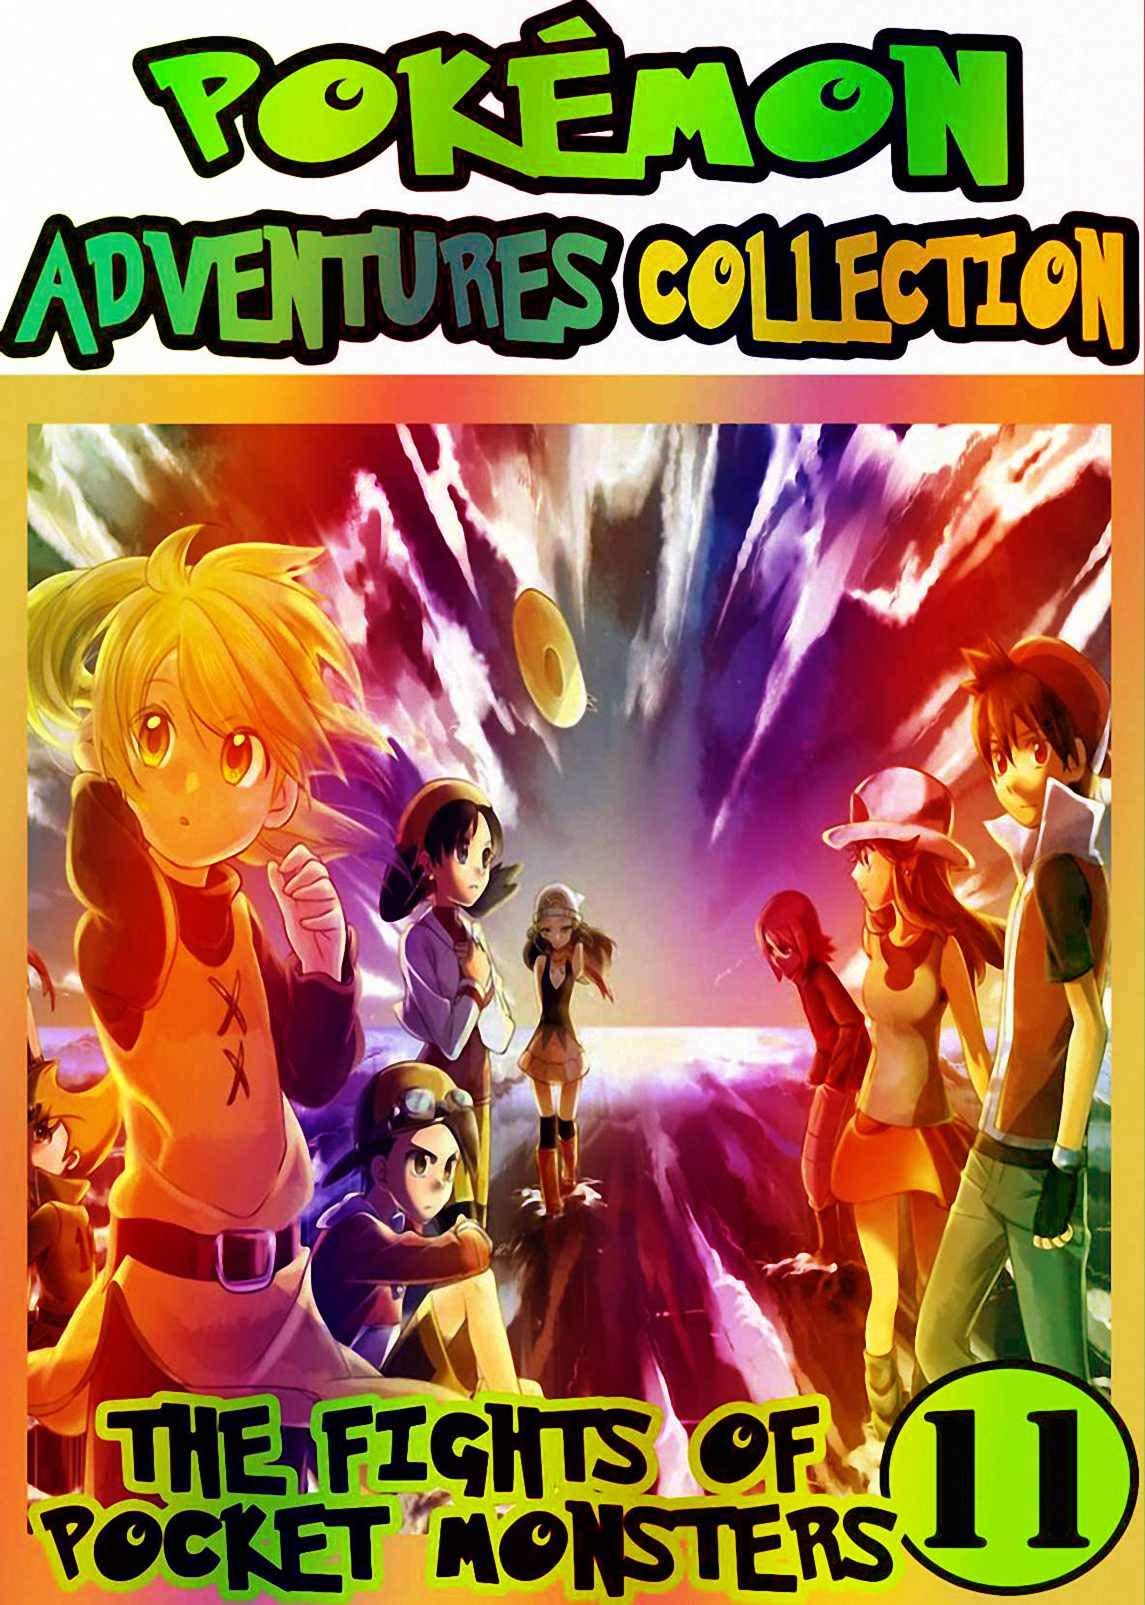 Pocket Adventure: Collection Pack 11 - Pocket Monsters Manga Adventures Pokemon Graphic Novel For Kids, Children